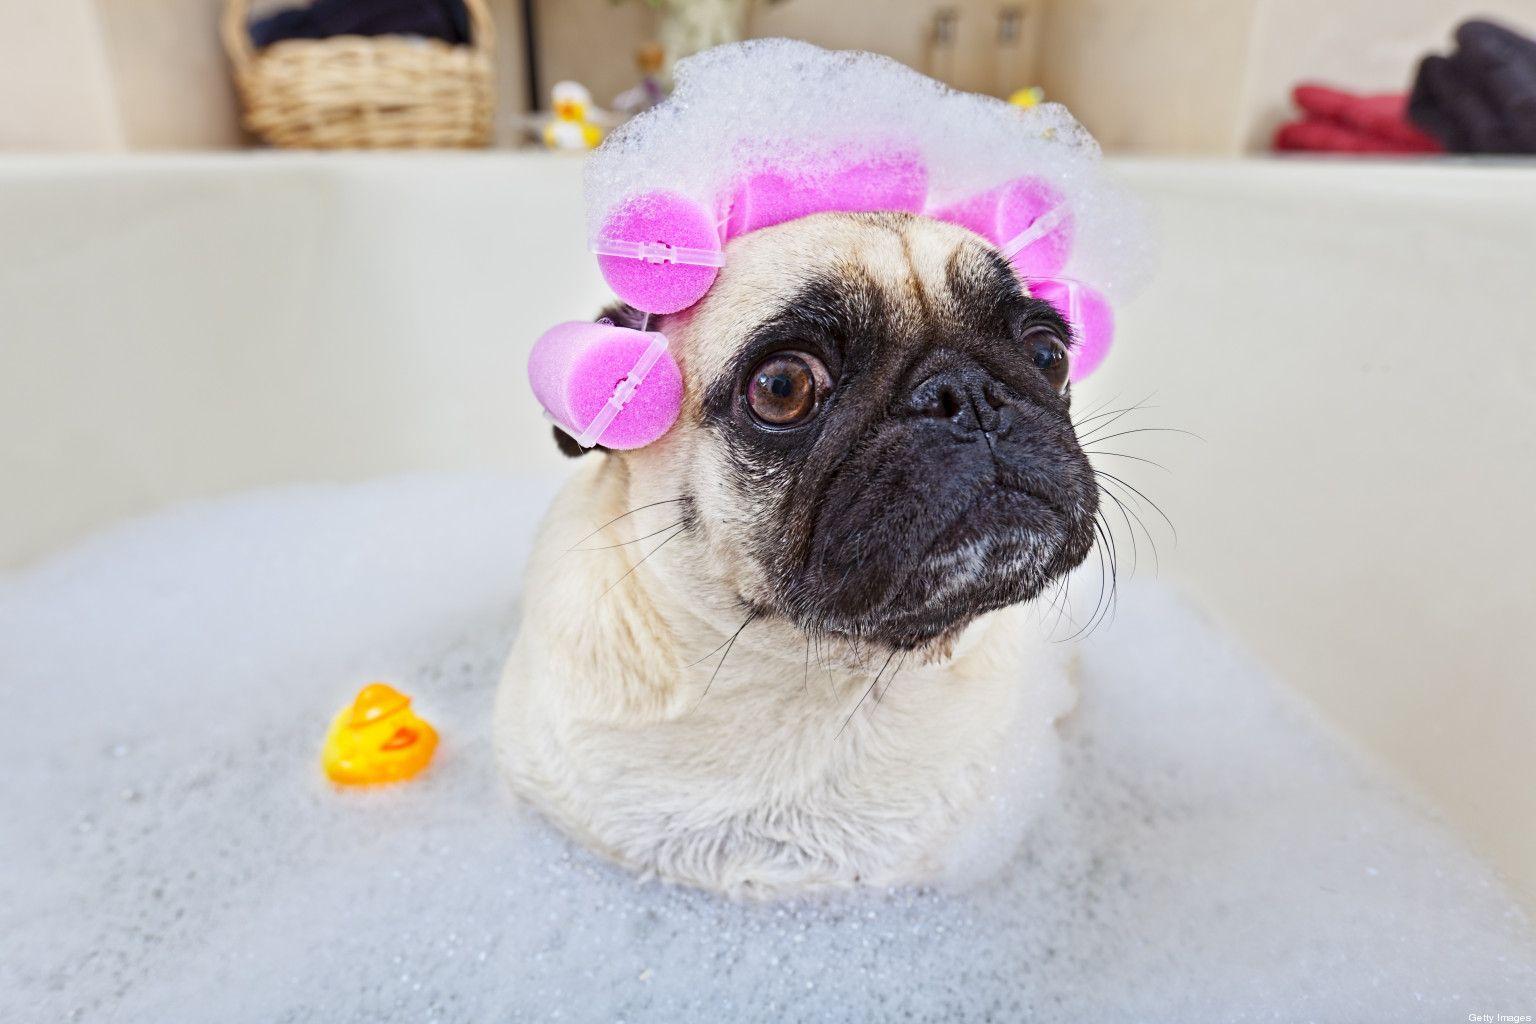 Te Preocupa La Piel De Tu Mascota Prueba Revital Shampoo Vet Line De Nogga El Champu Nogga Revital Esta Formulado A Base De Ing Perros Banar Perro Mascotas